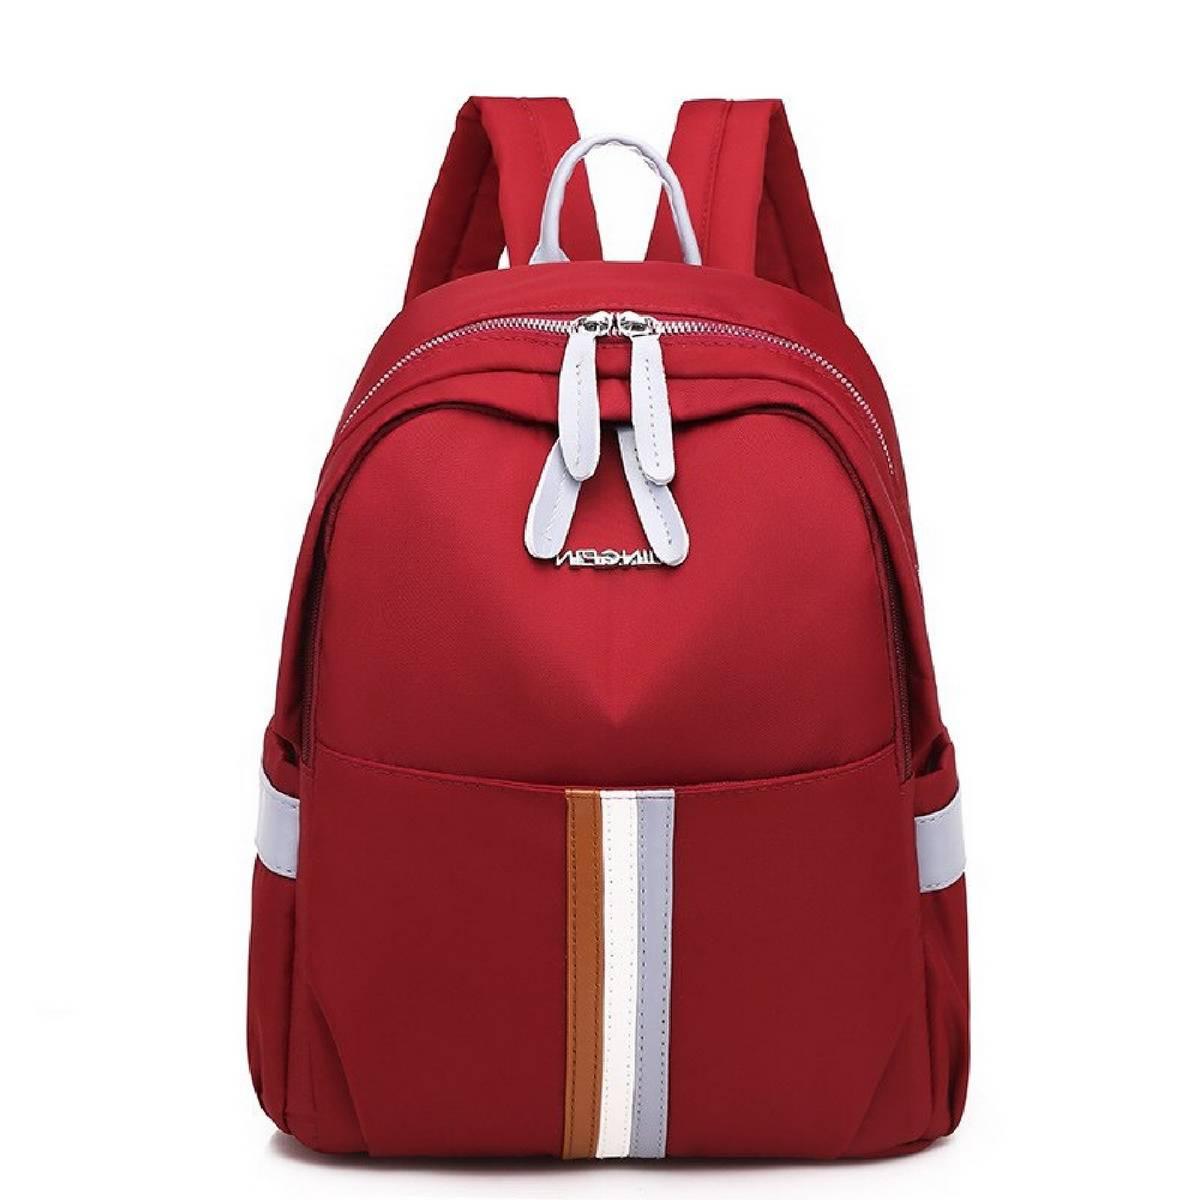 Red / Black Backpack for girls & Boys, Naylon stuff waterproof College, School, University Bags Laptop size